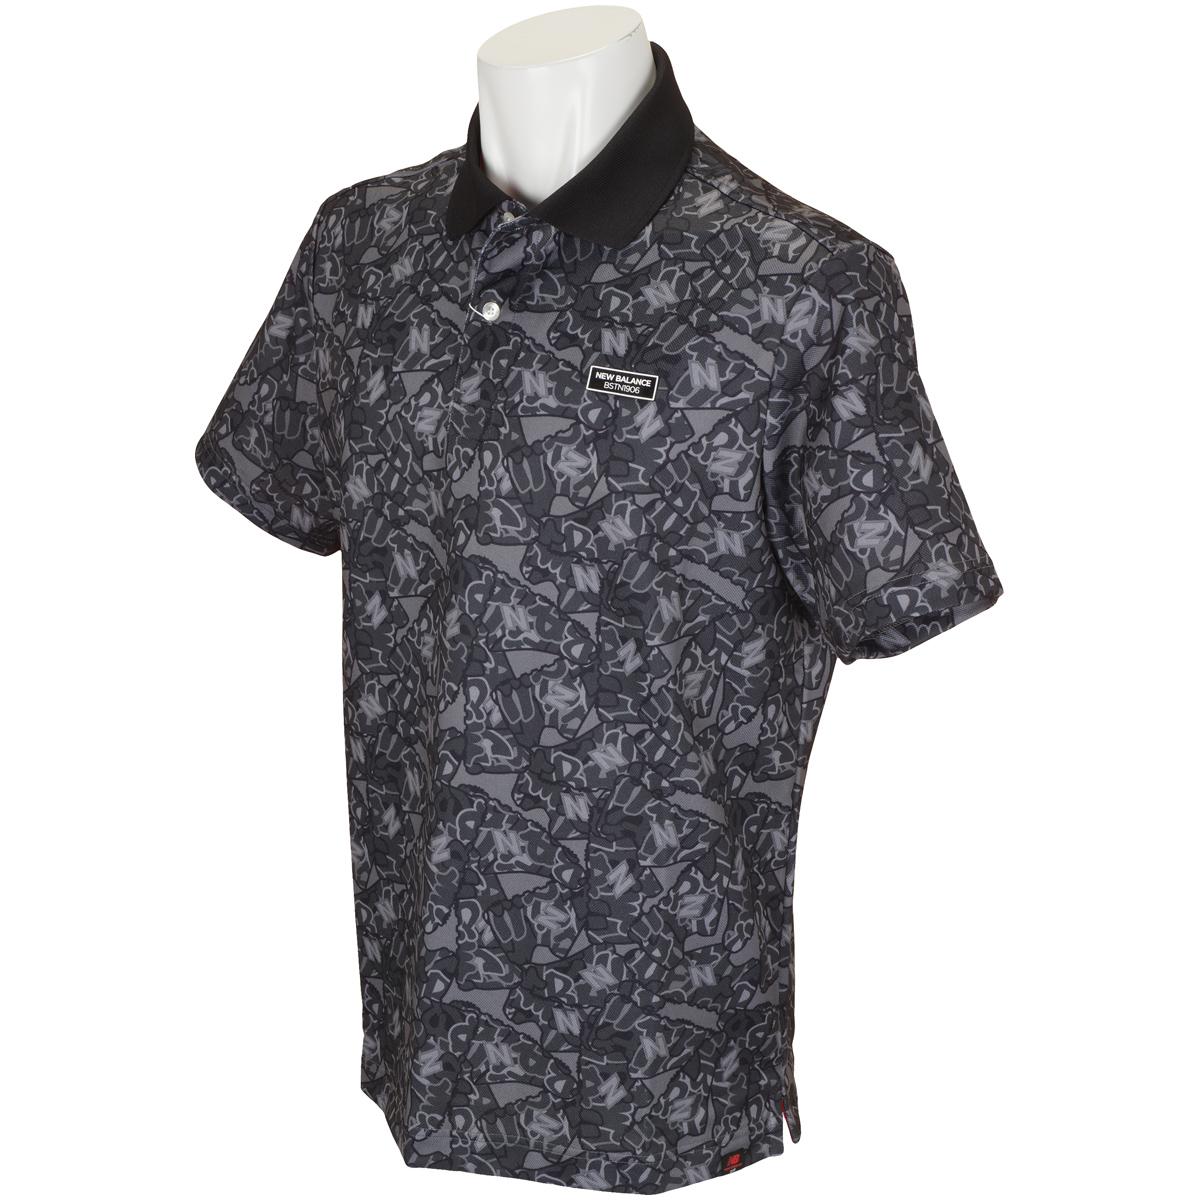 METRO グラフィティーシューズプリント半袖ポロシャツ